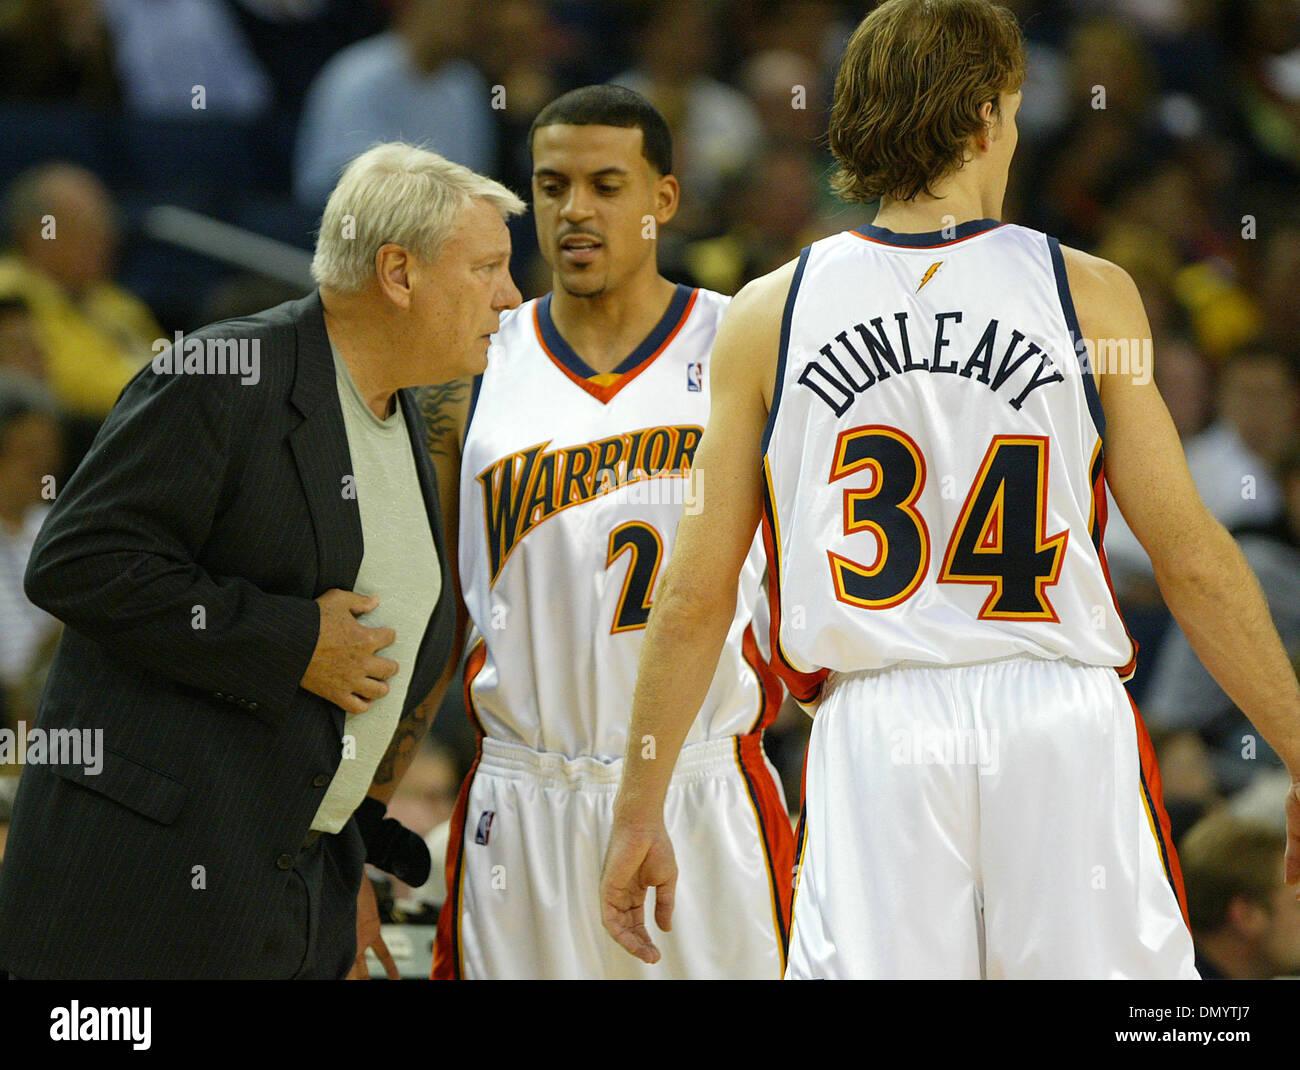 Nov 16 2006 Oakland CA USA Warriors head coach Don Nelson